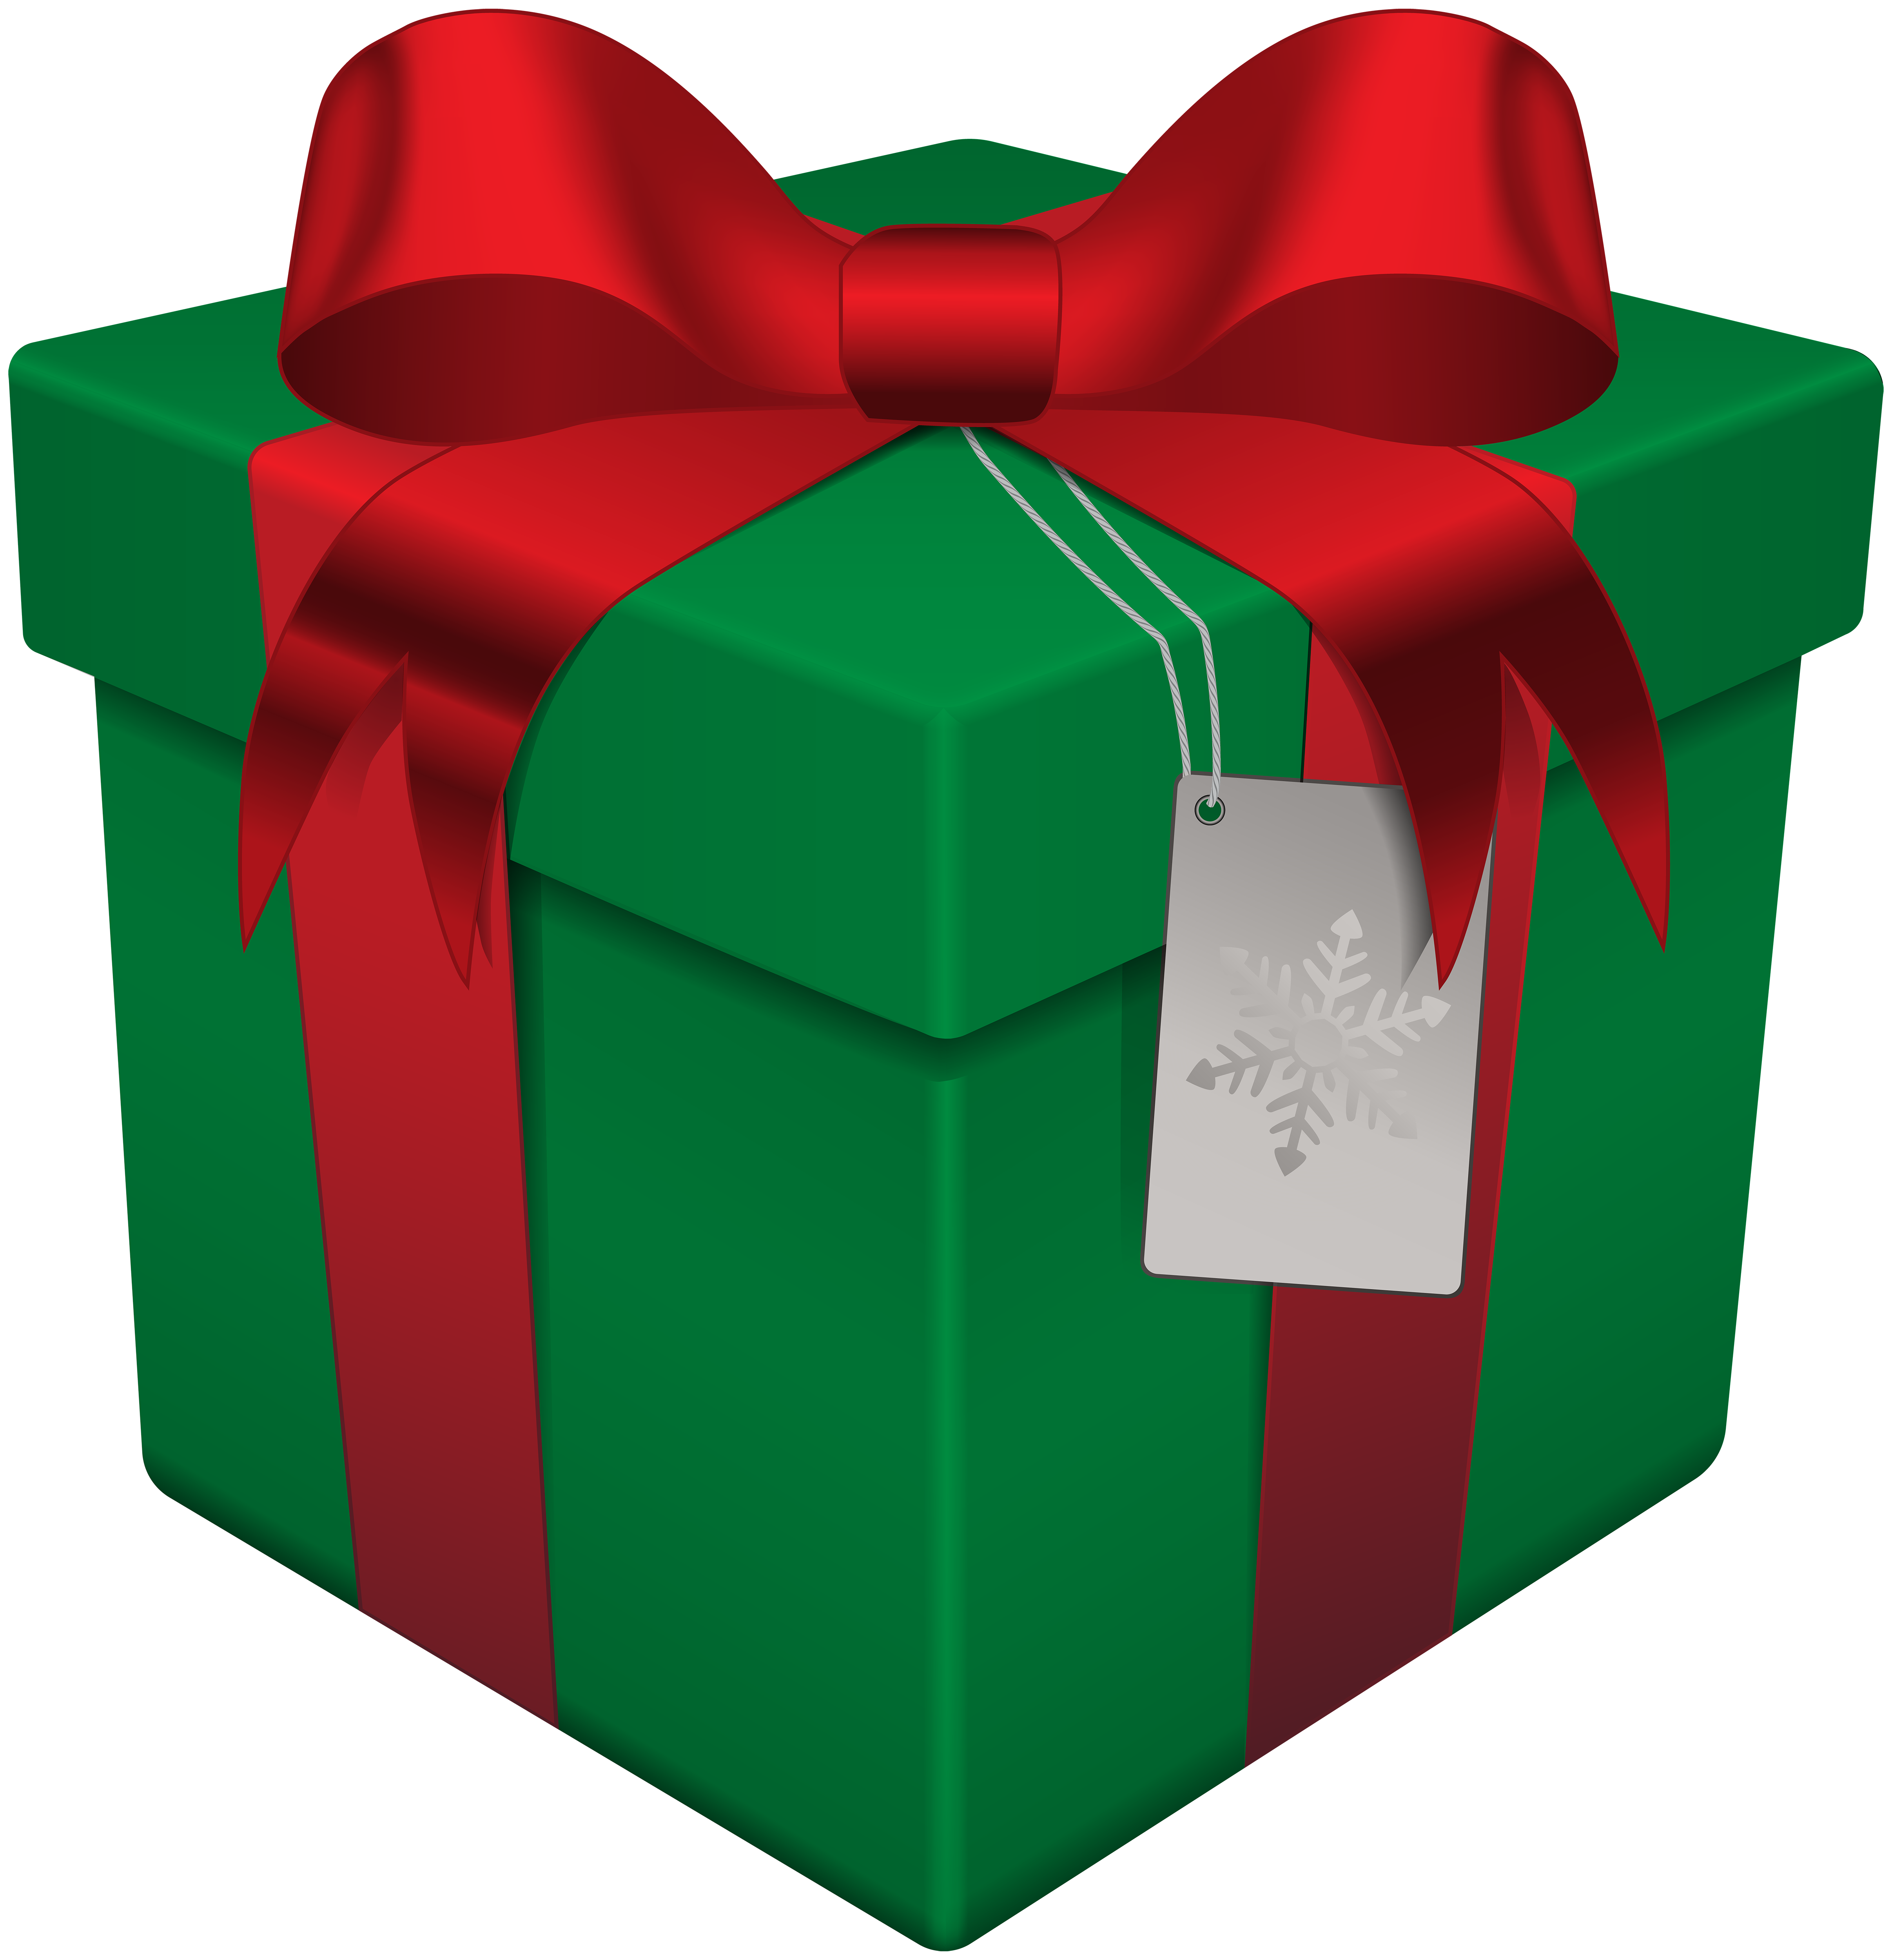 4827x5000 Christmas Gift Box Green Transparent Png Clip Artu200b Gallery